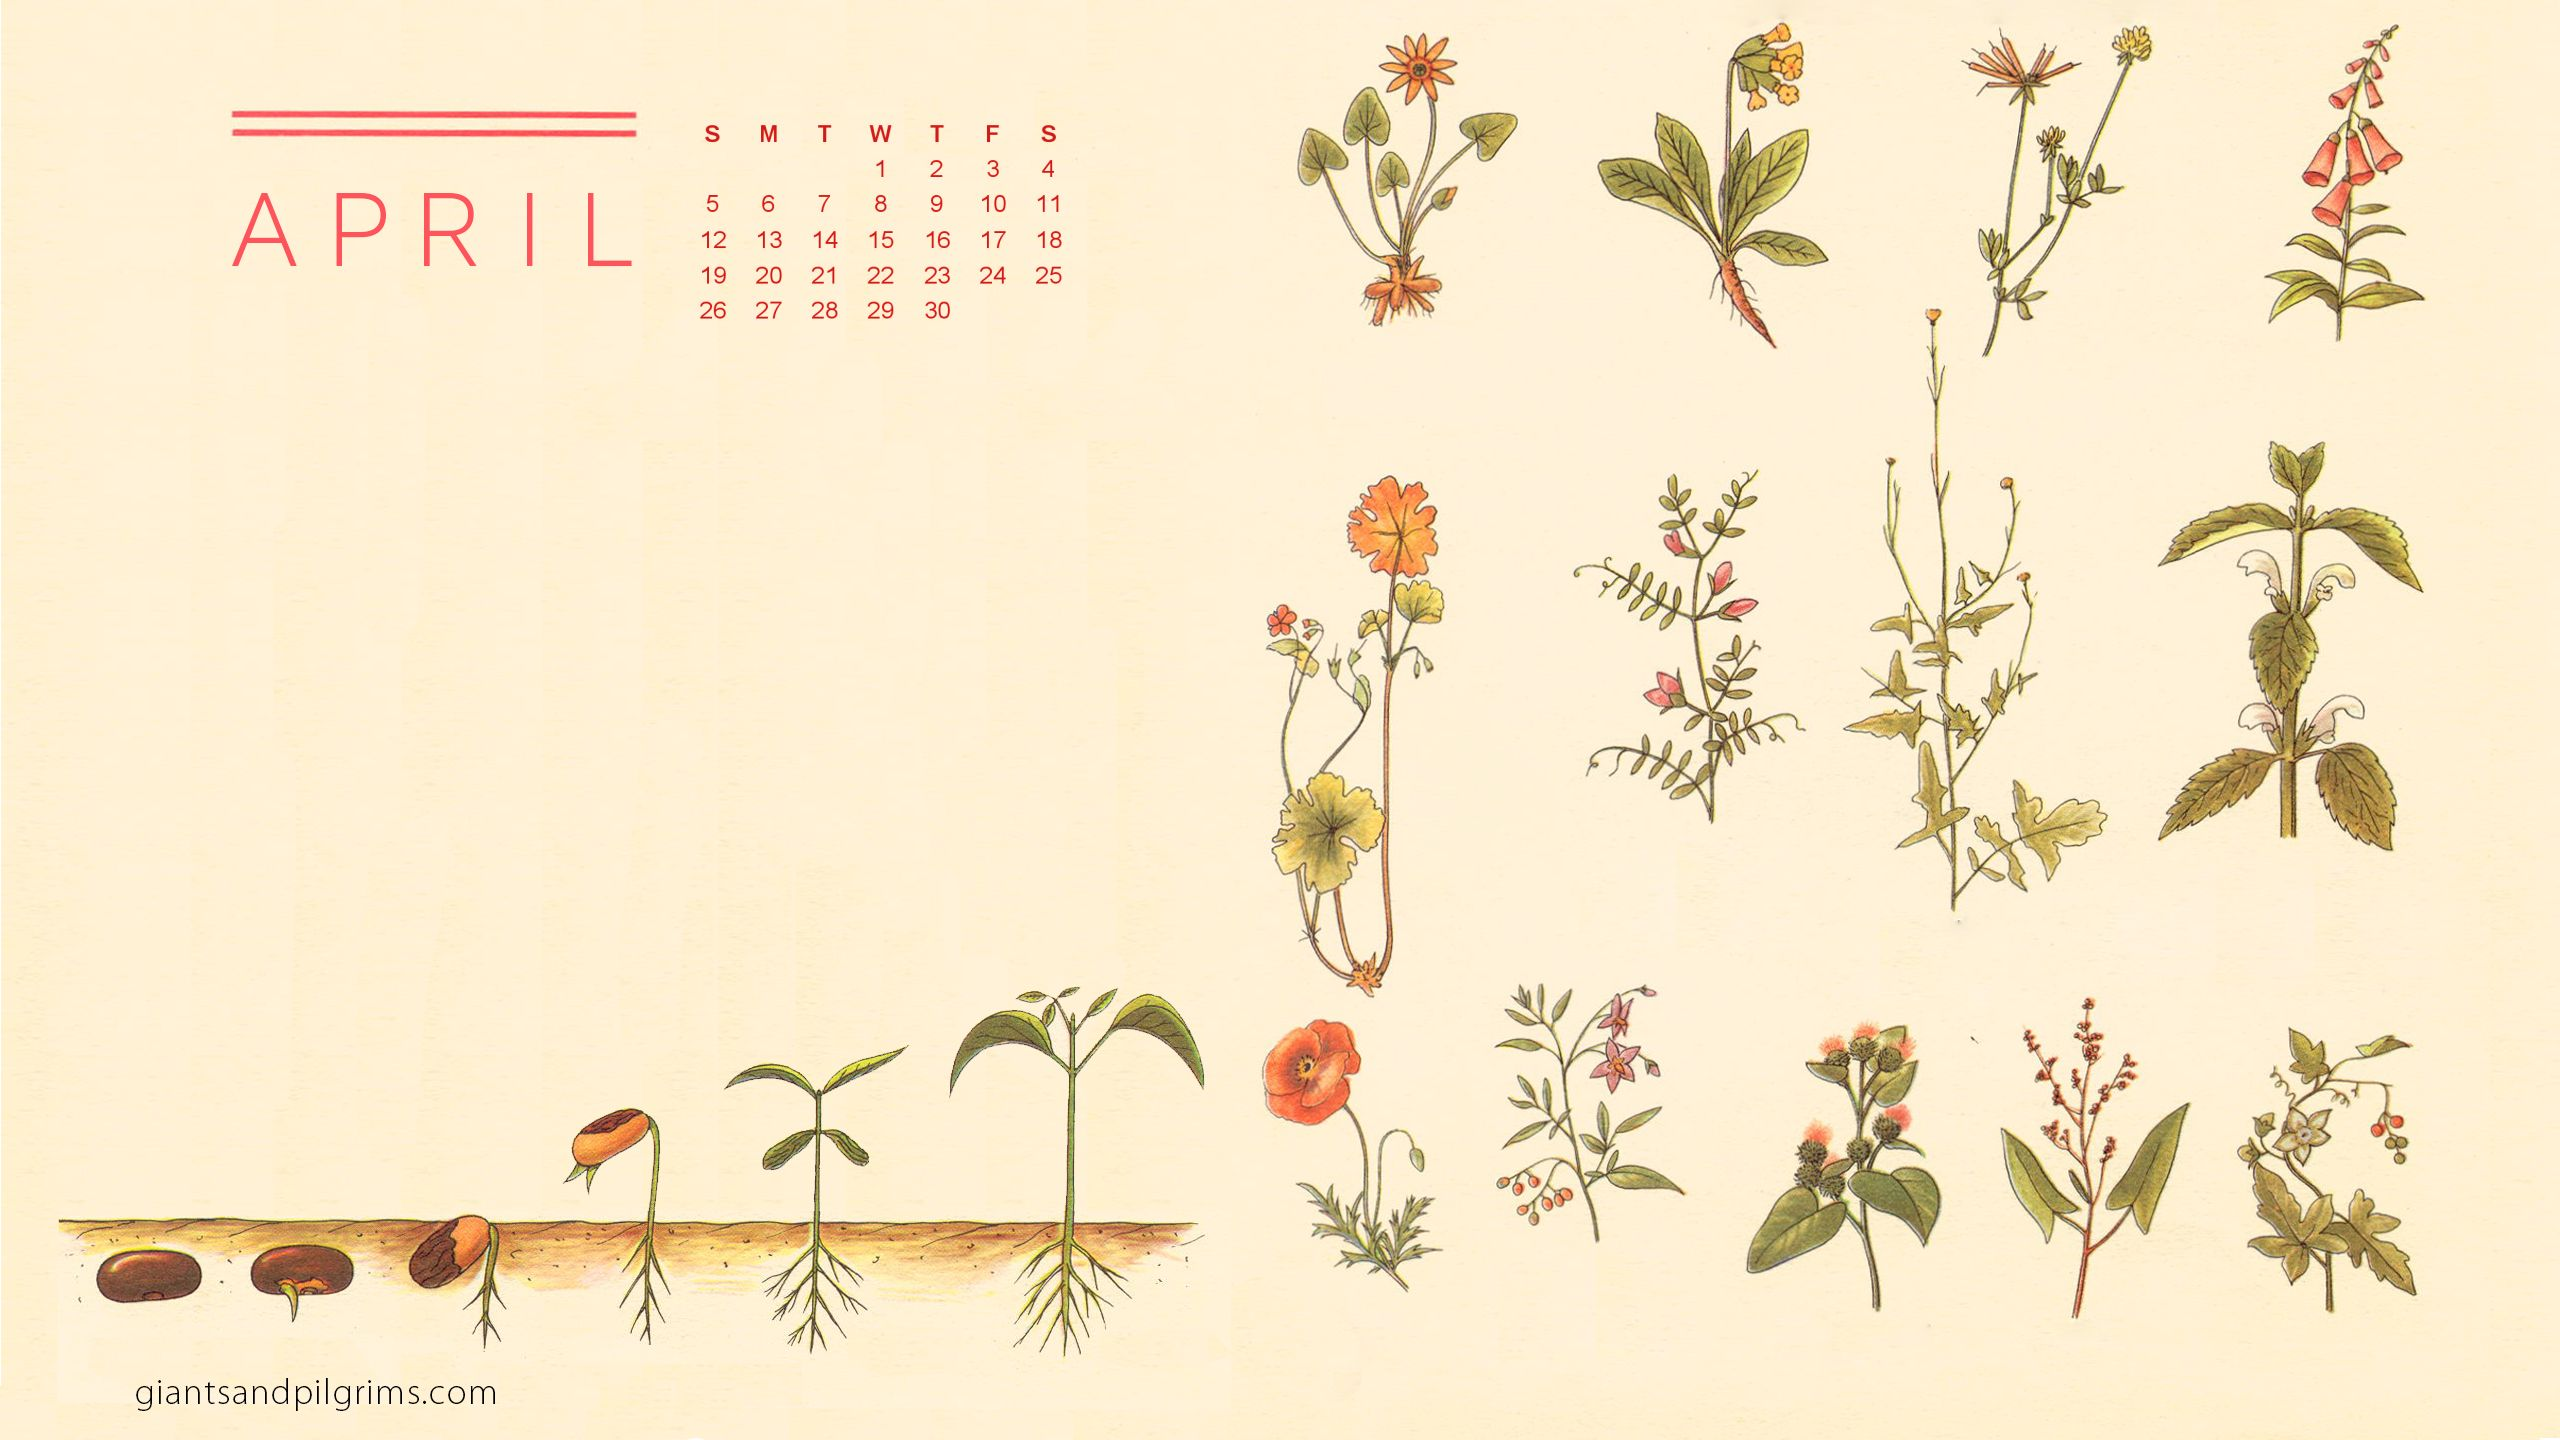 April 2015 Desktop Wallpaper